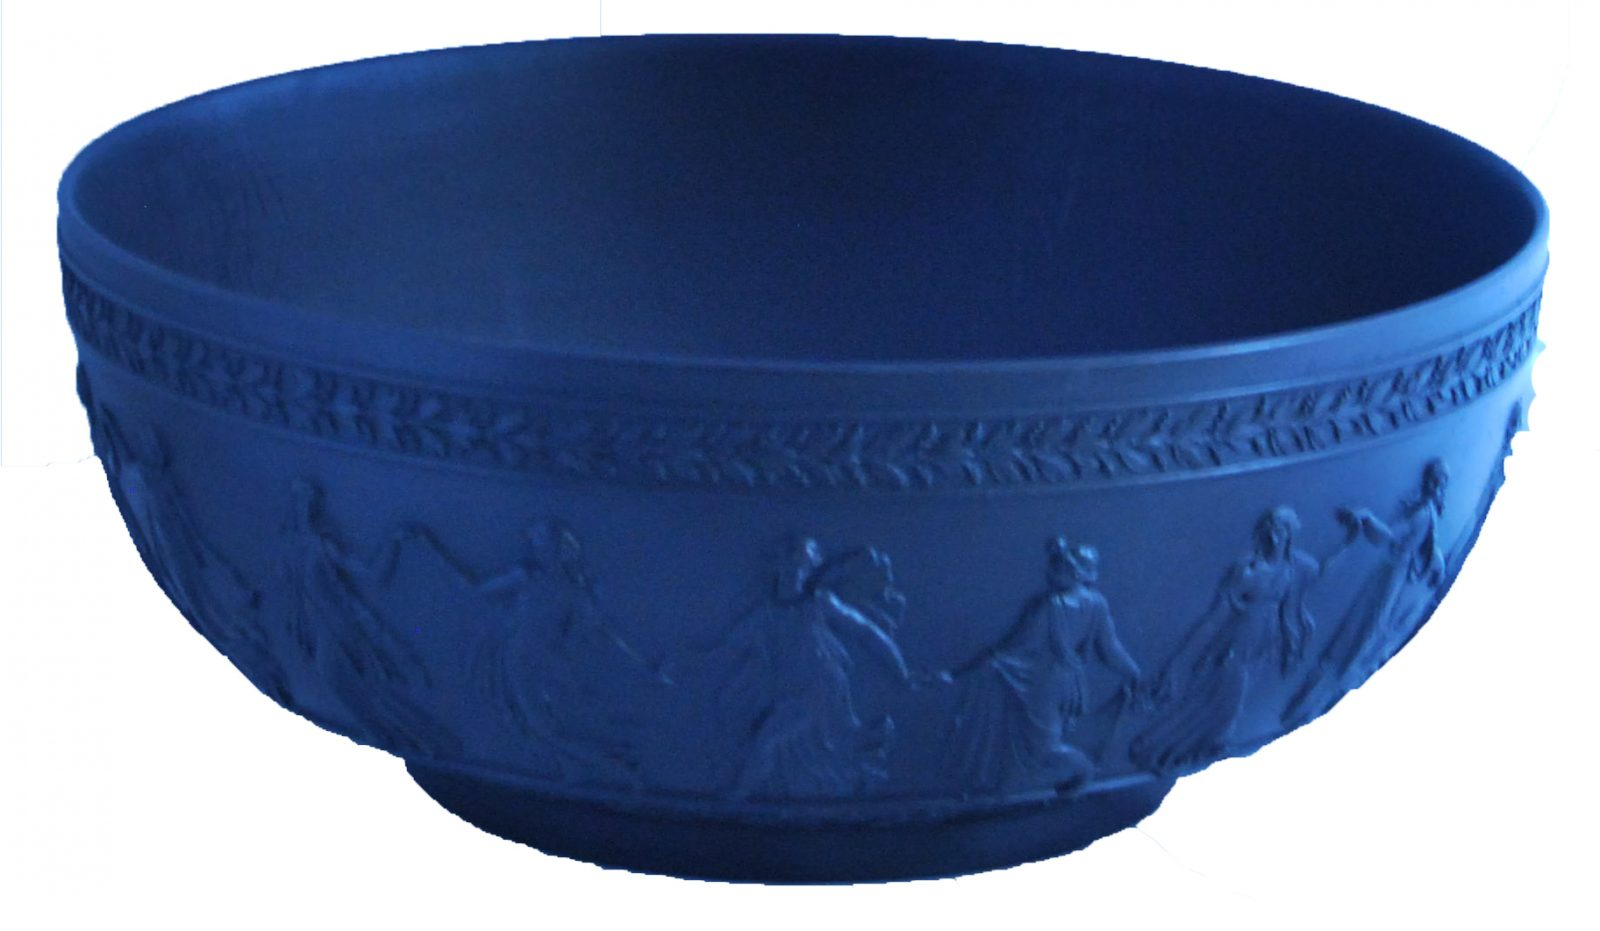 Wedgwood Jasperware Black Basalt Bowl